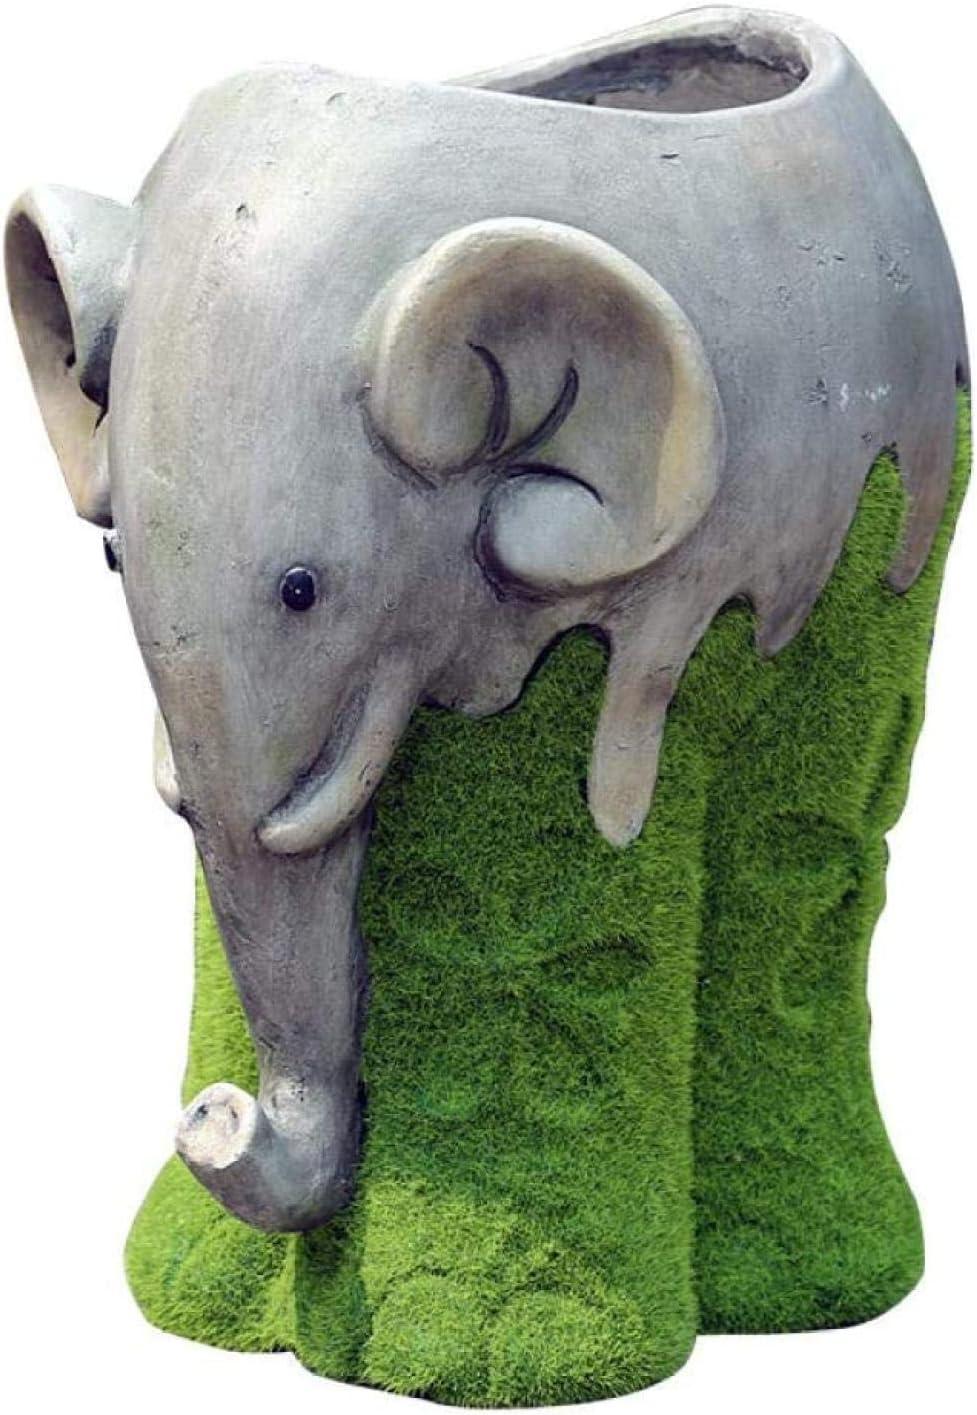 shipfree GenericBrands Sculpture Decoration S Statue Genuine Free Shipping